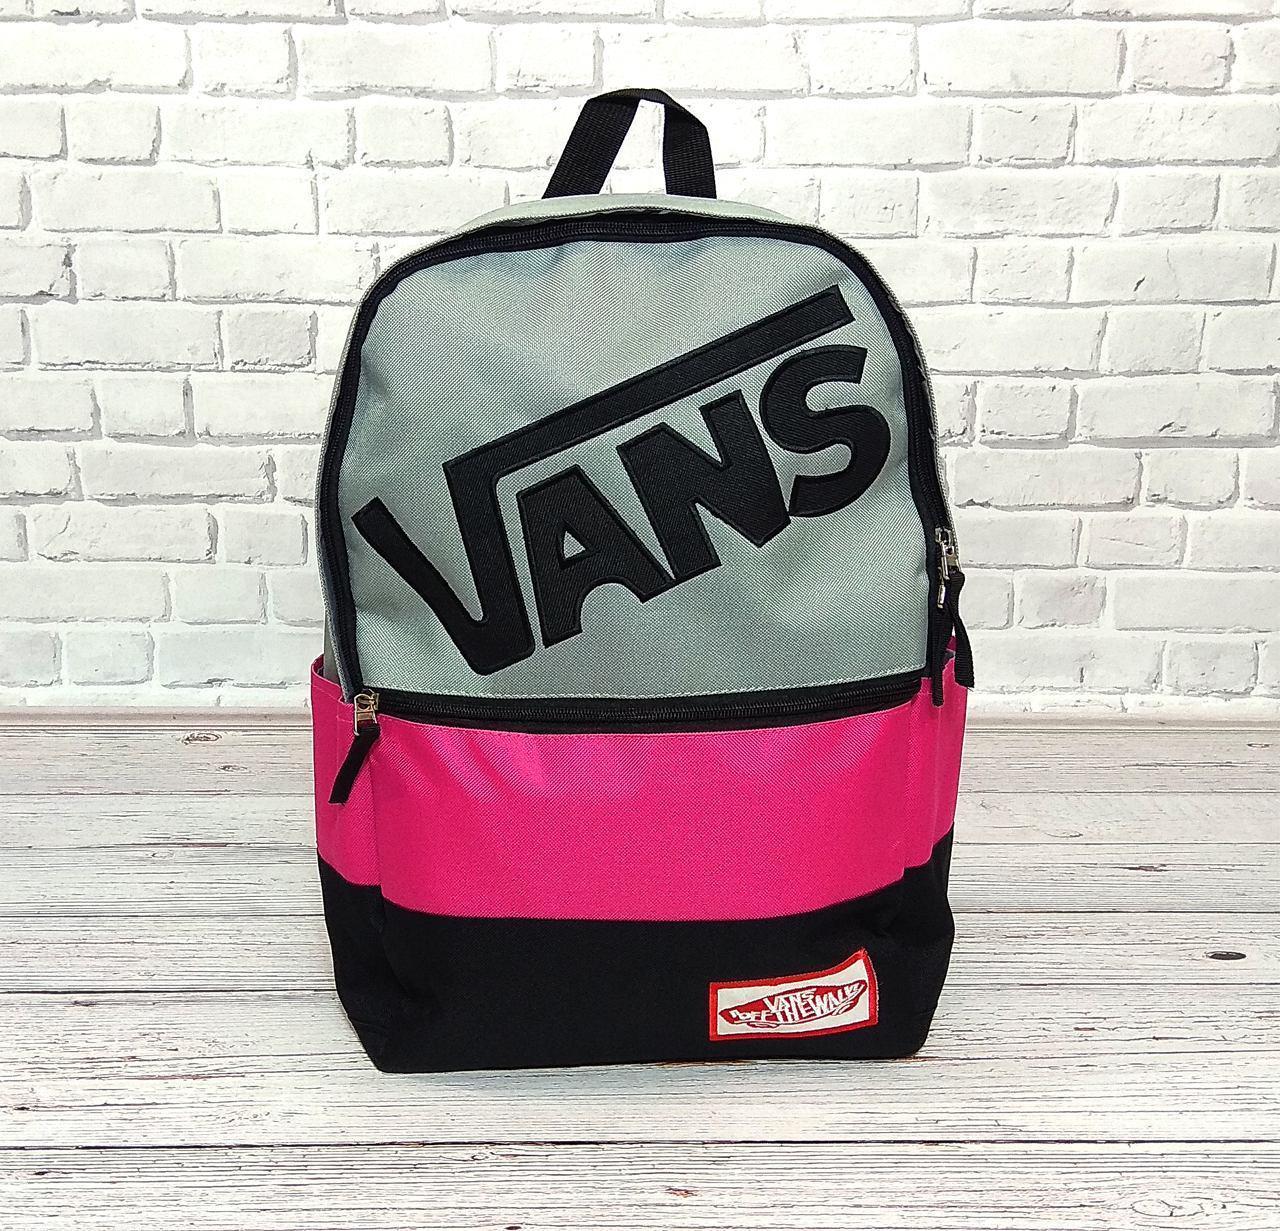 Серый с розовым рюкзак ванс, Vans of the Wall., фото 1